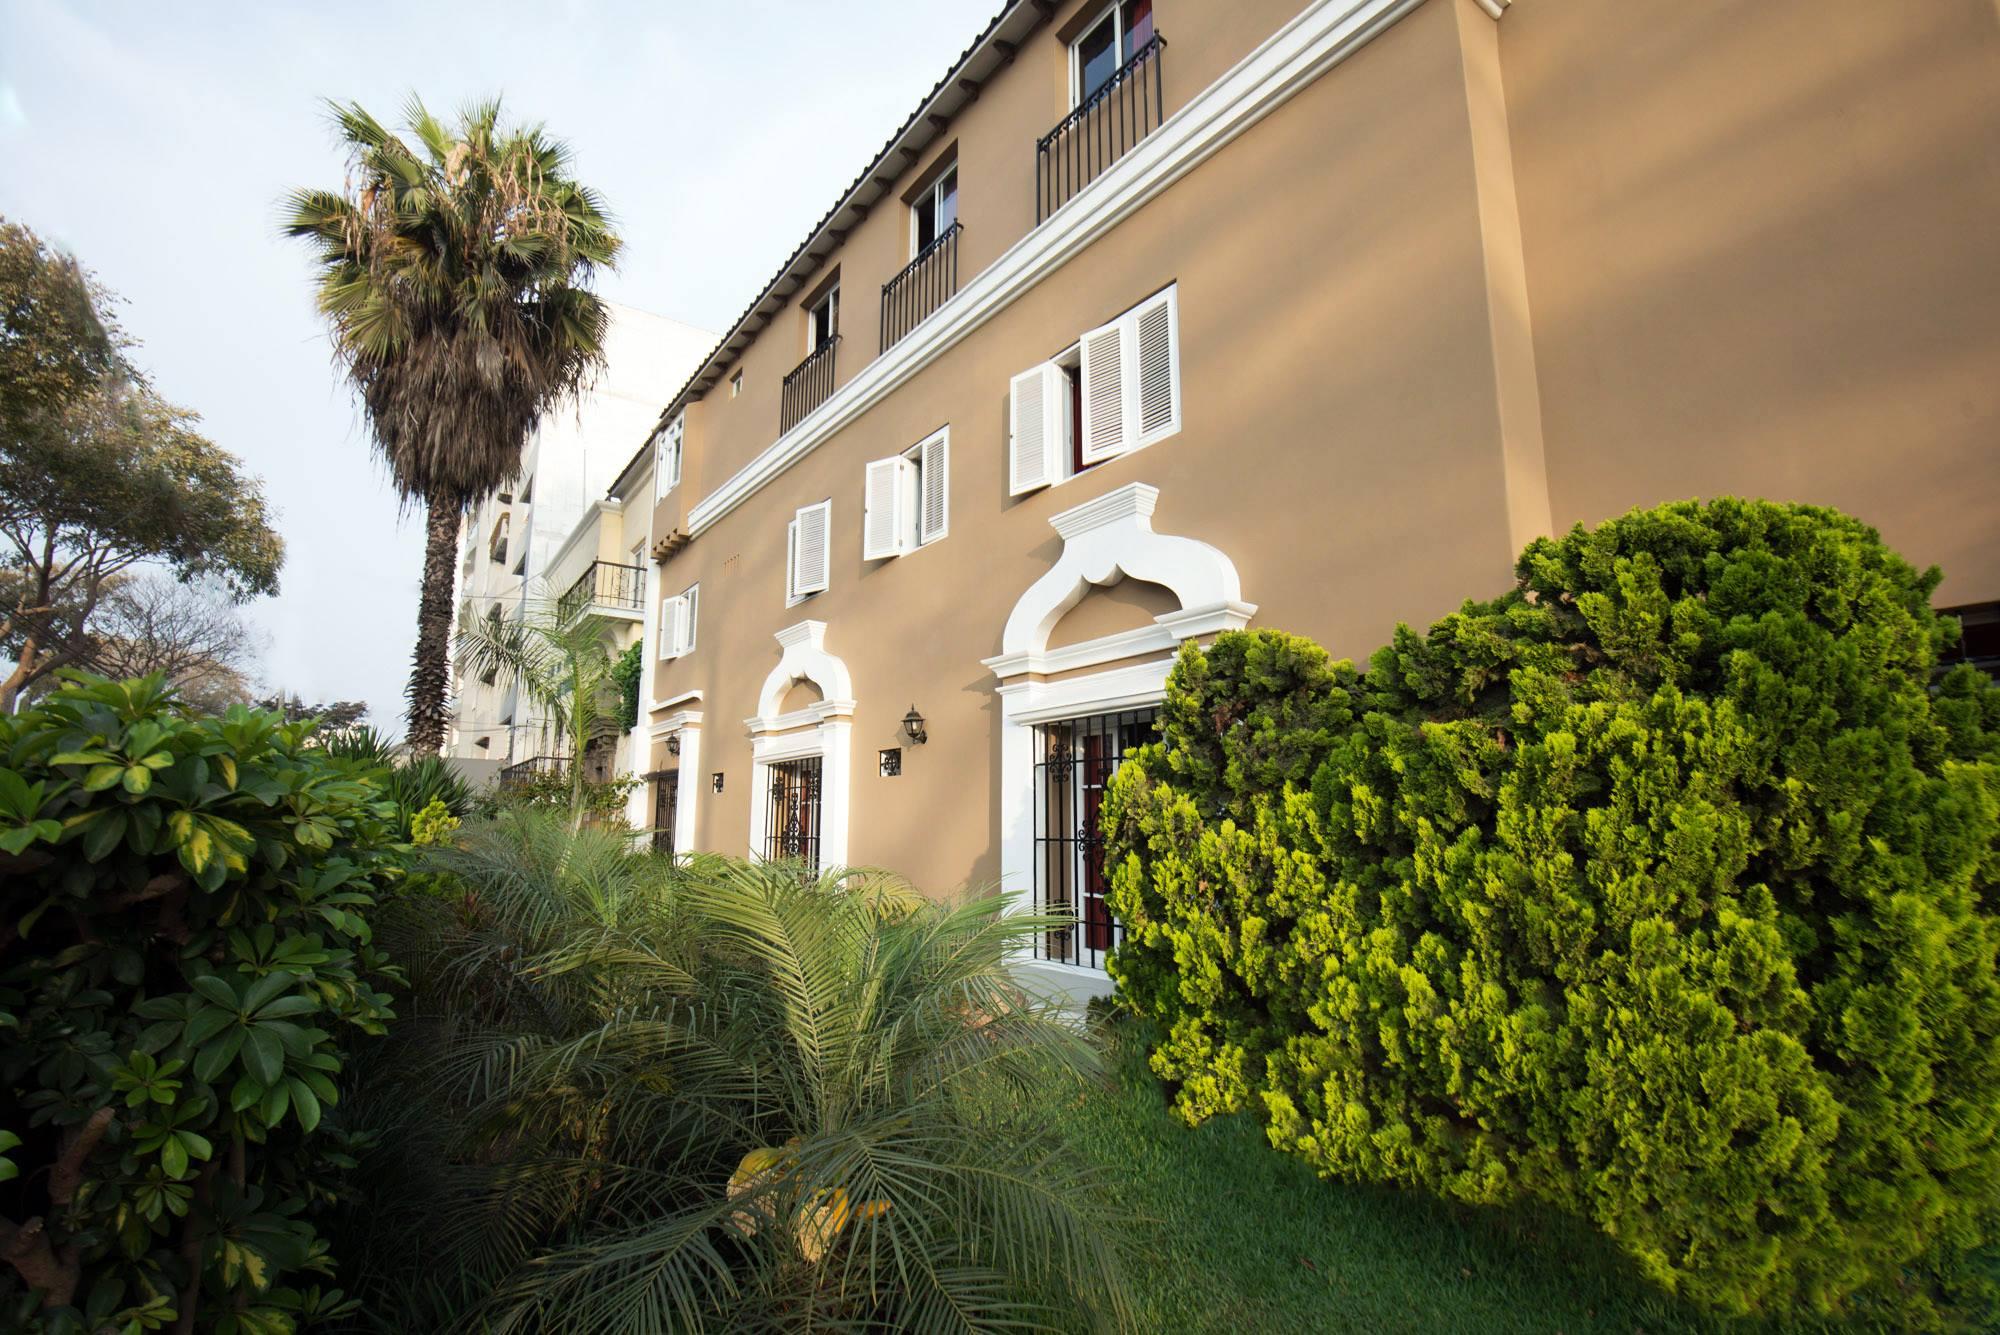 Hotel San Antonio Abad - External Garden